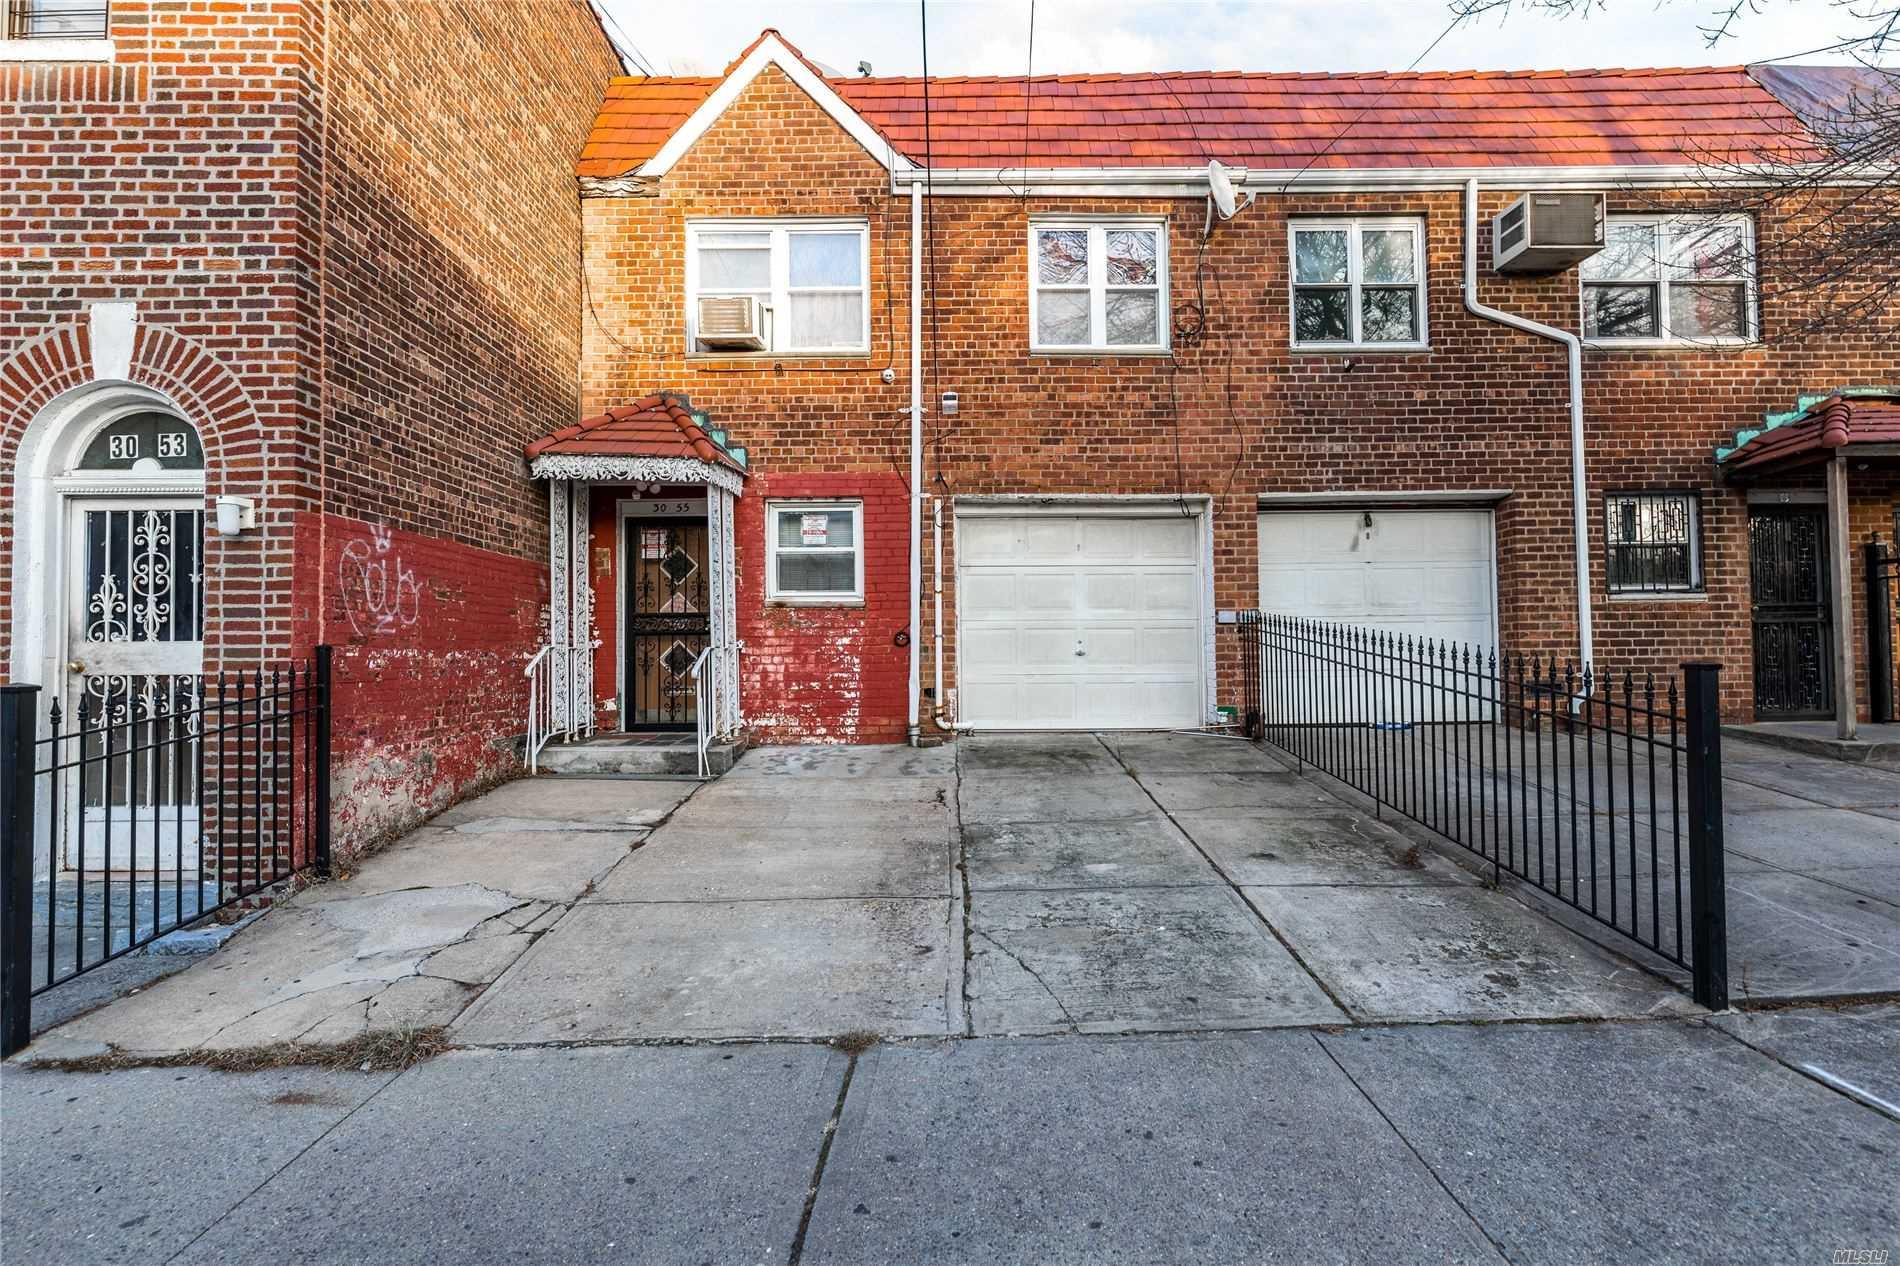 Property for sale at 30-55 82nd Street, E. Elmhurst NY 11370, E. Elmhurst,  New York 11370